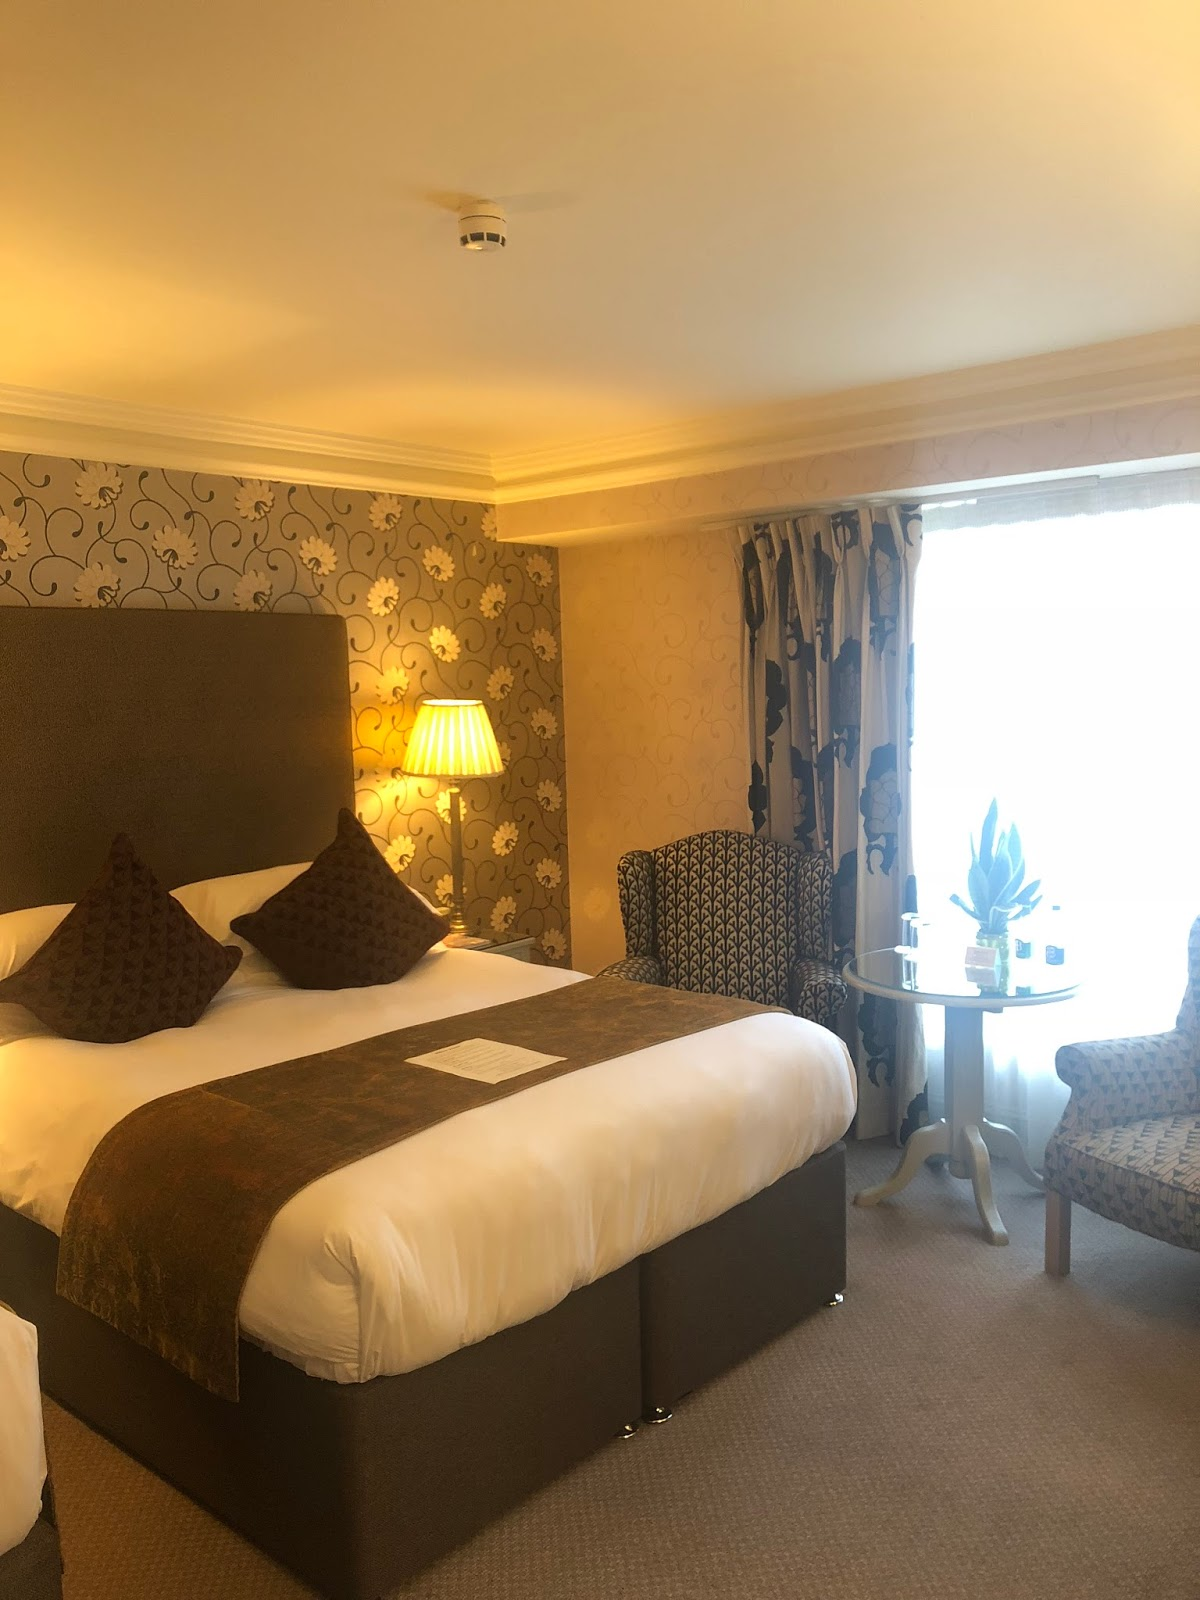 Where to stay in dubin, dublin hotels, hotels in Ireland